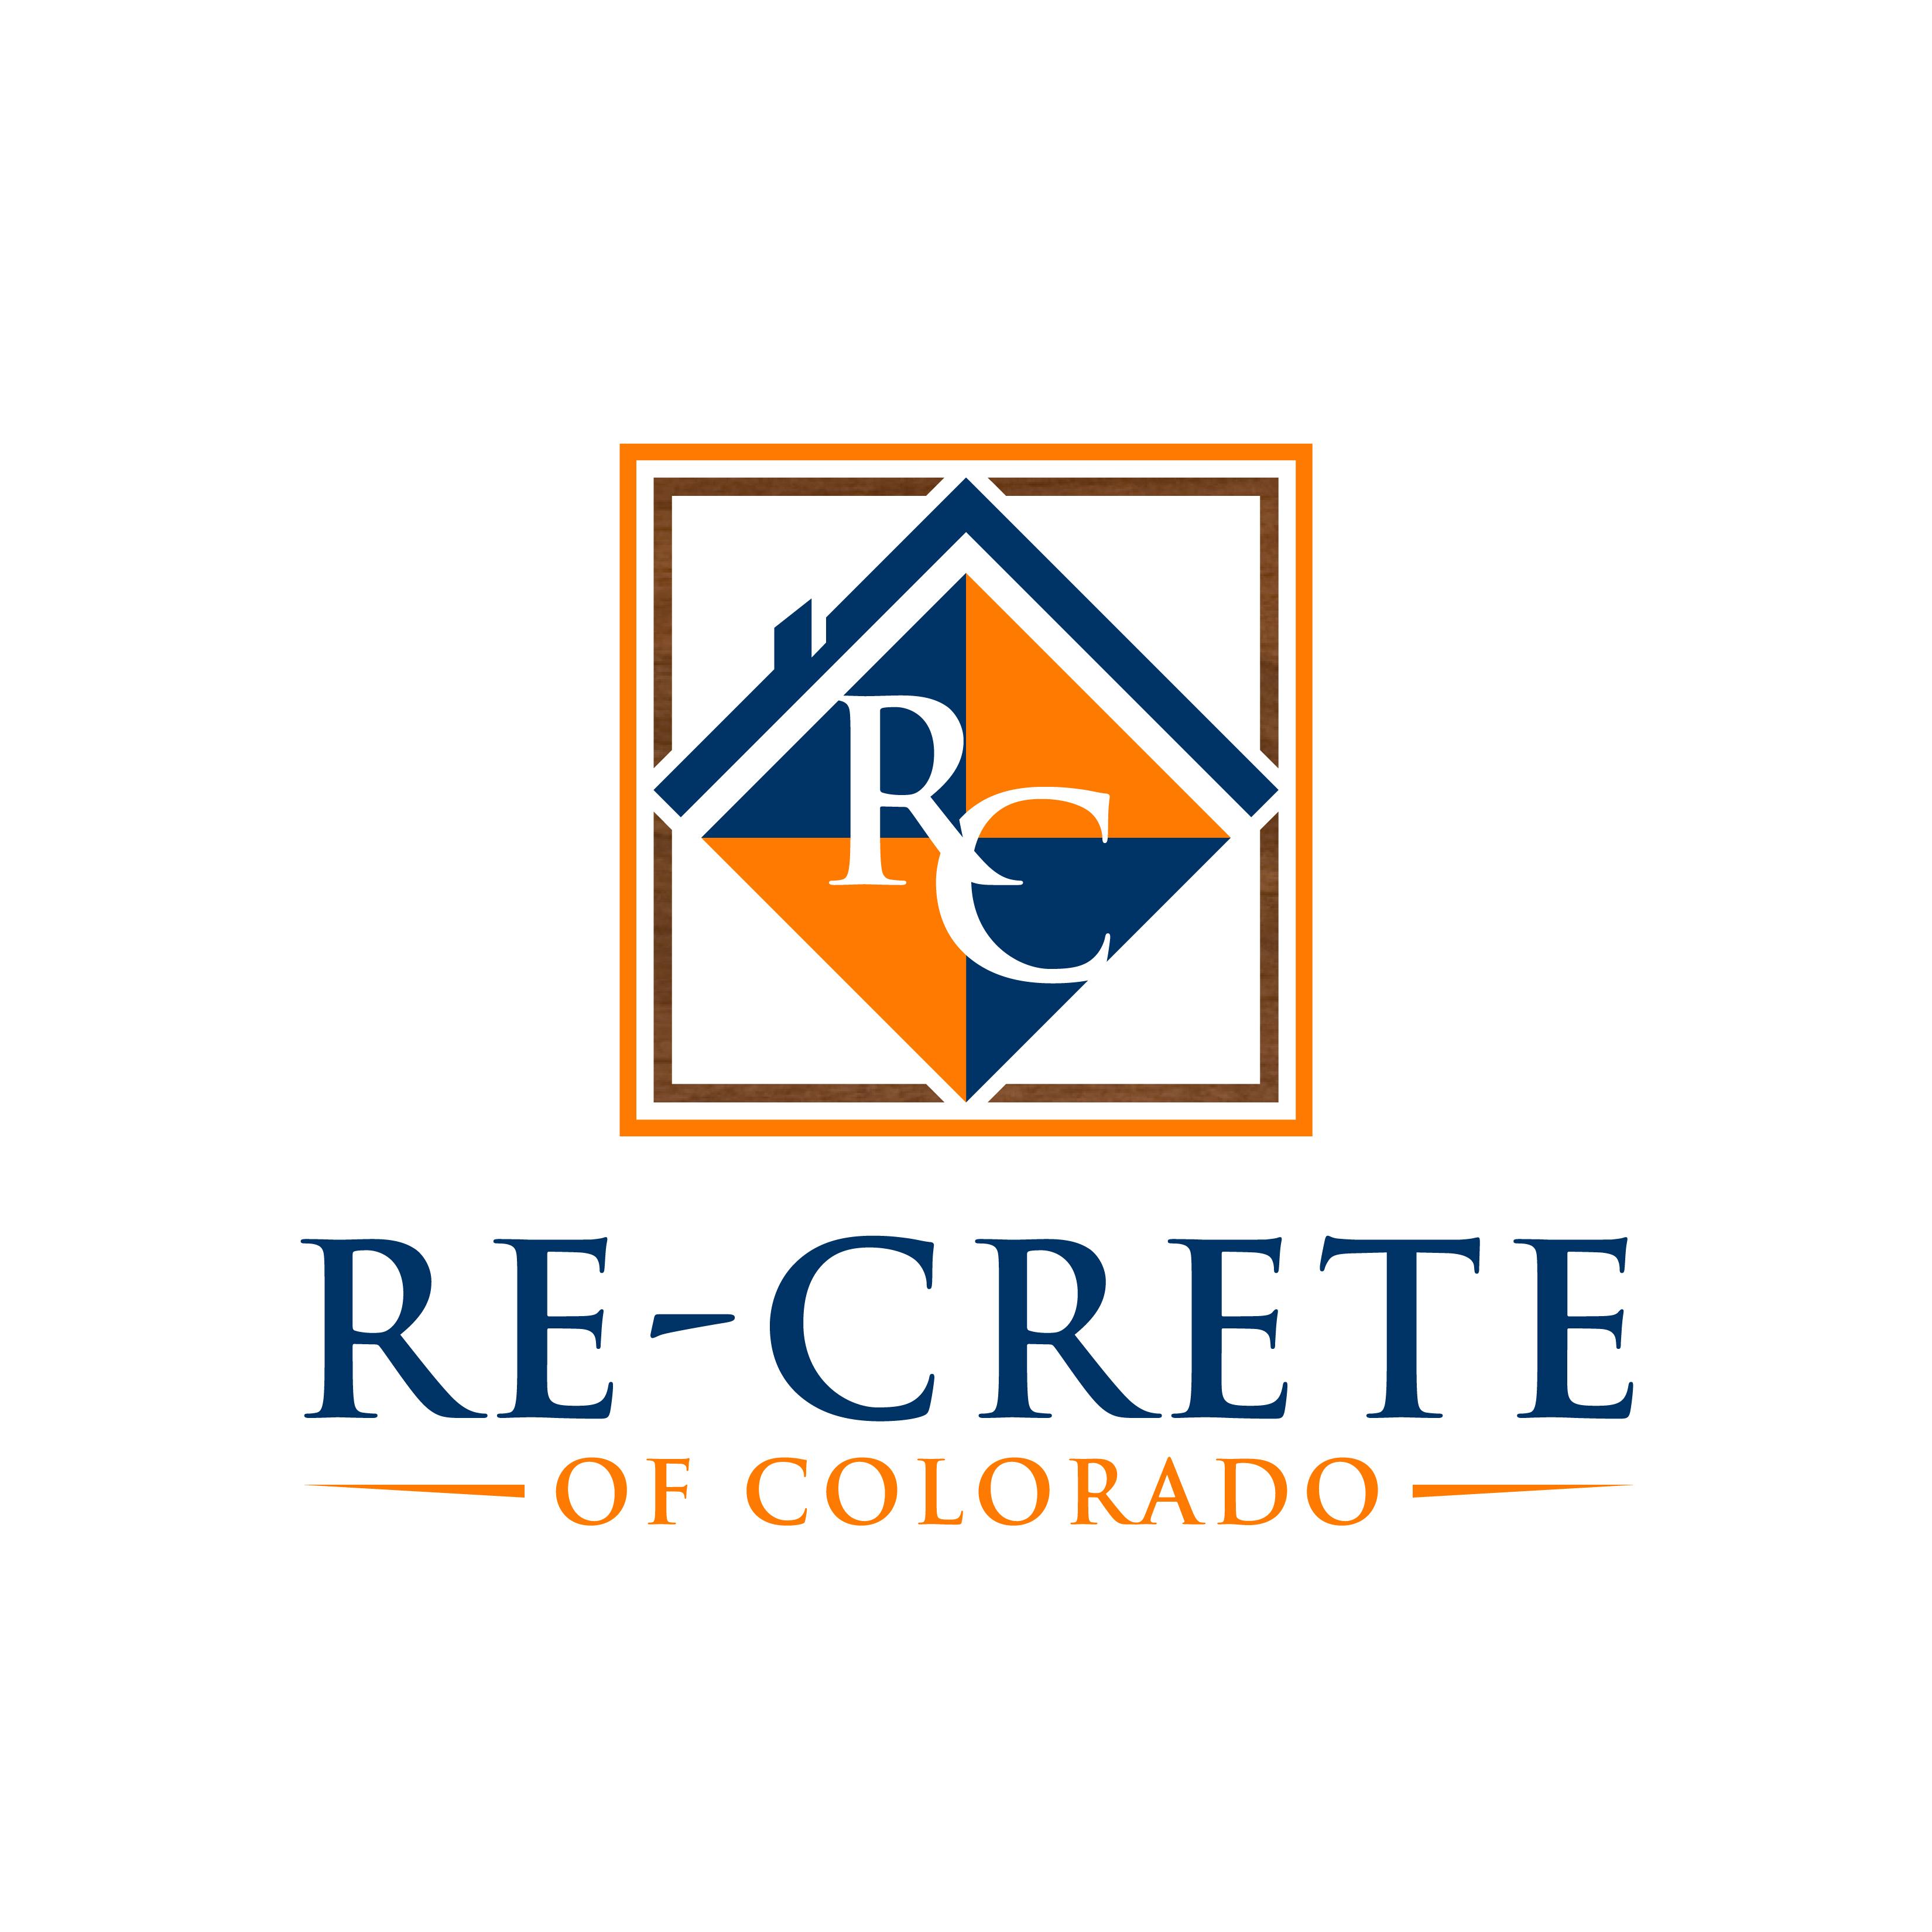 Re-Crete of Colorado